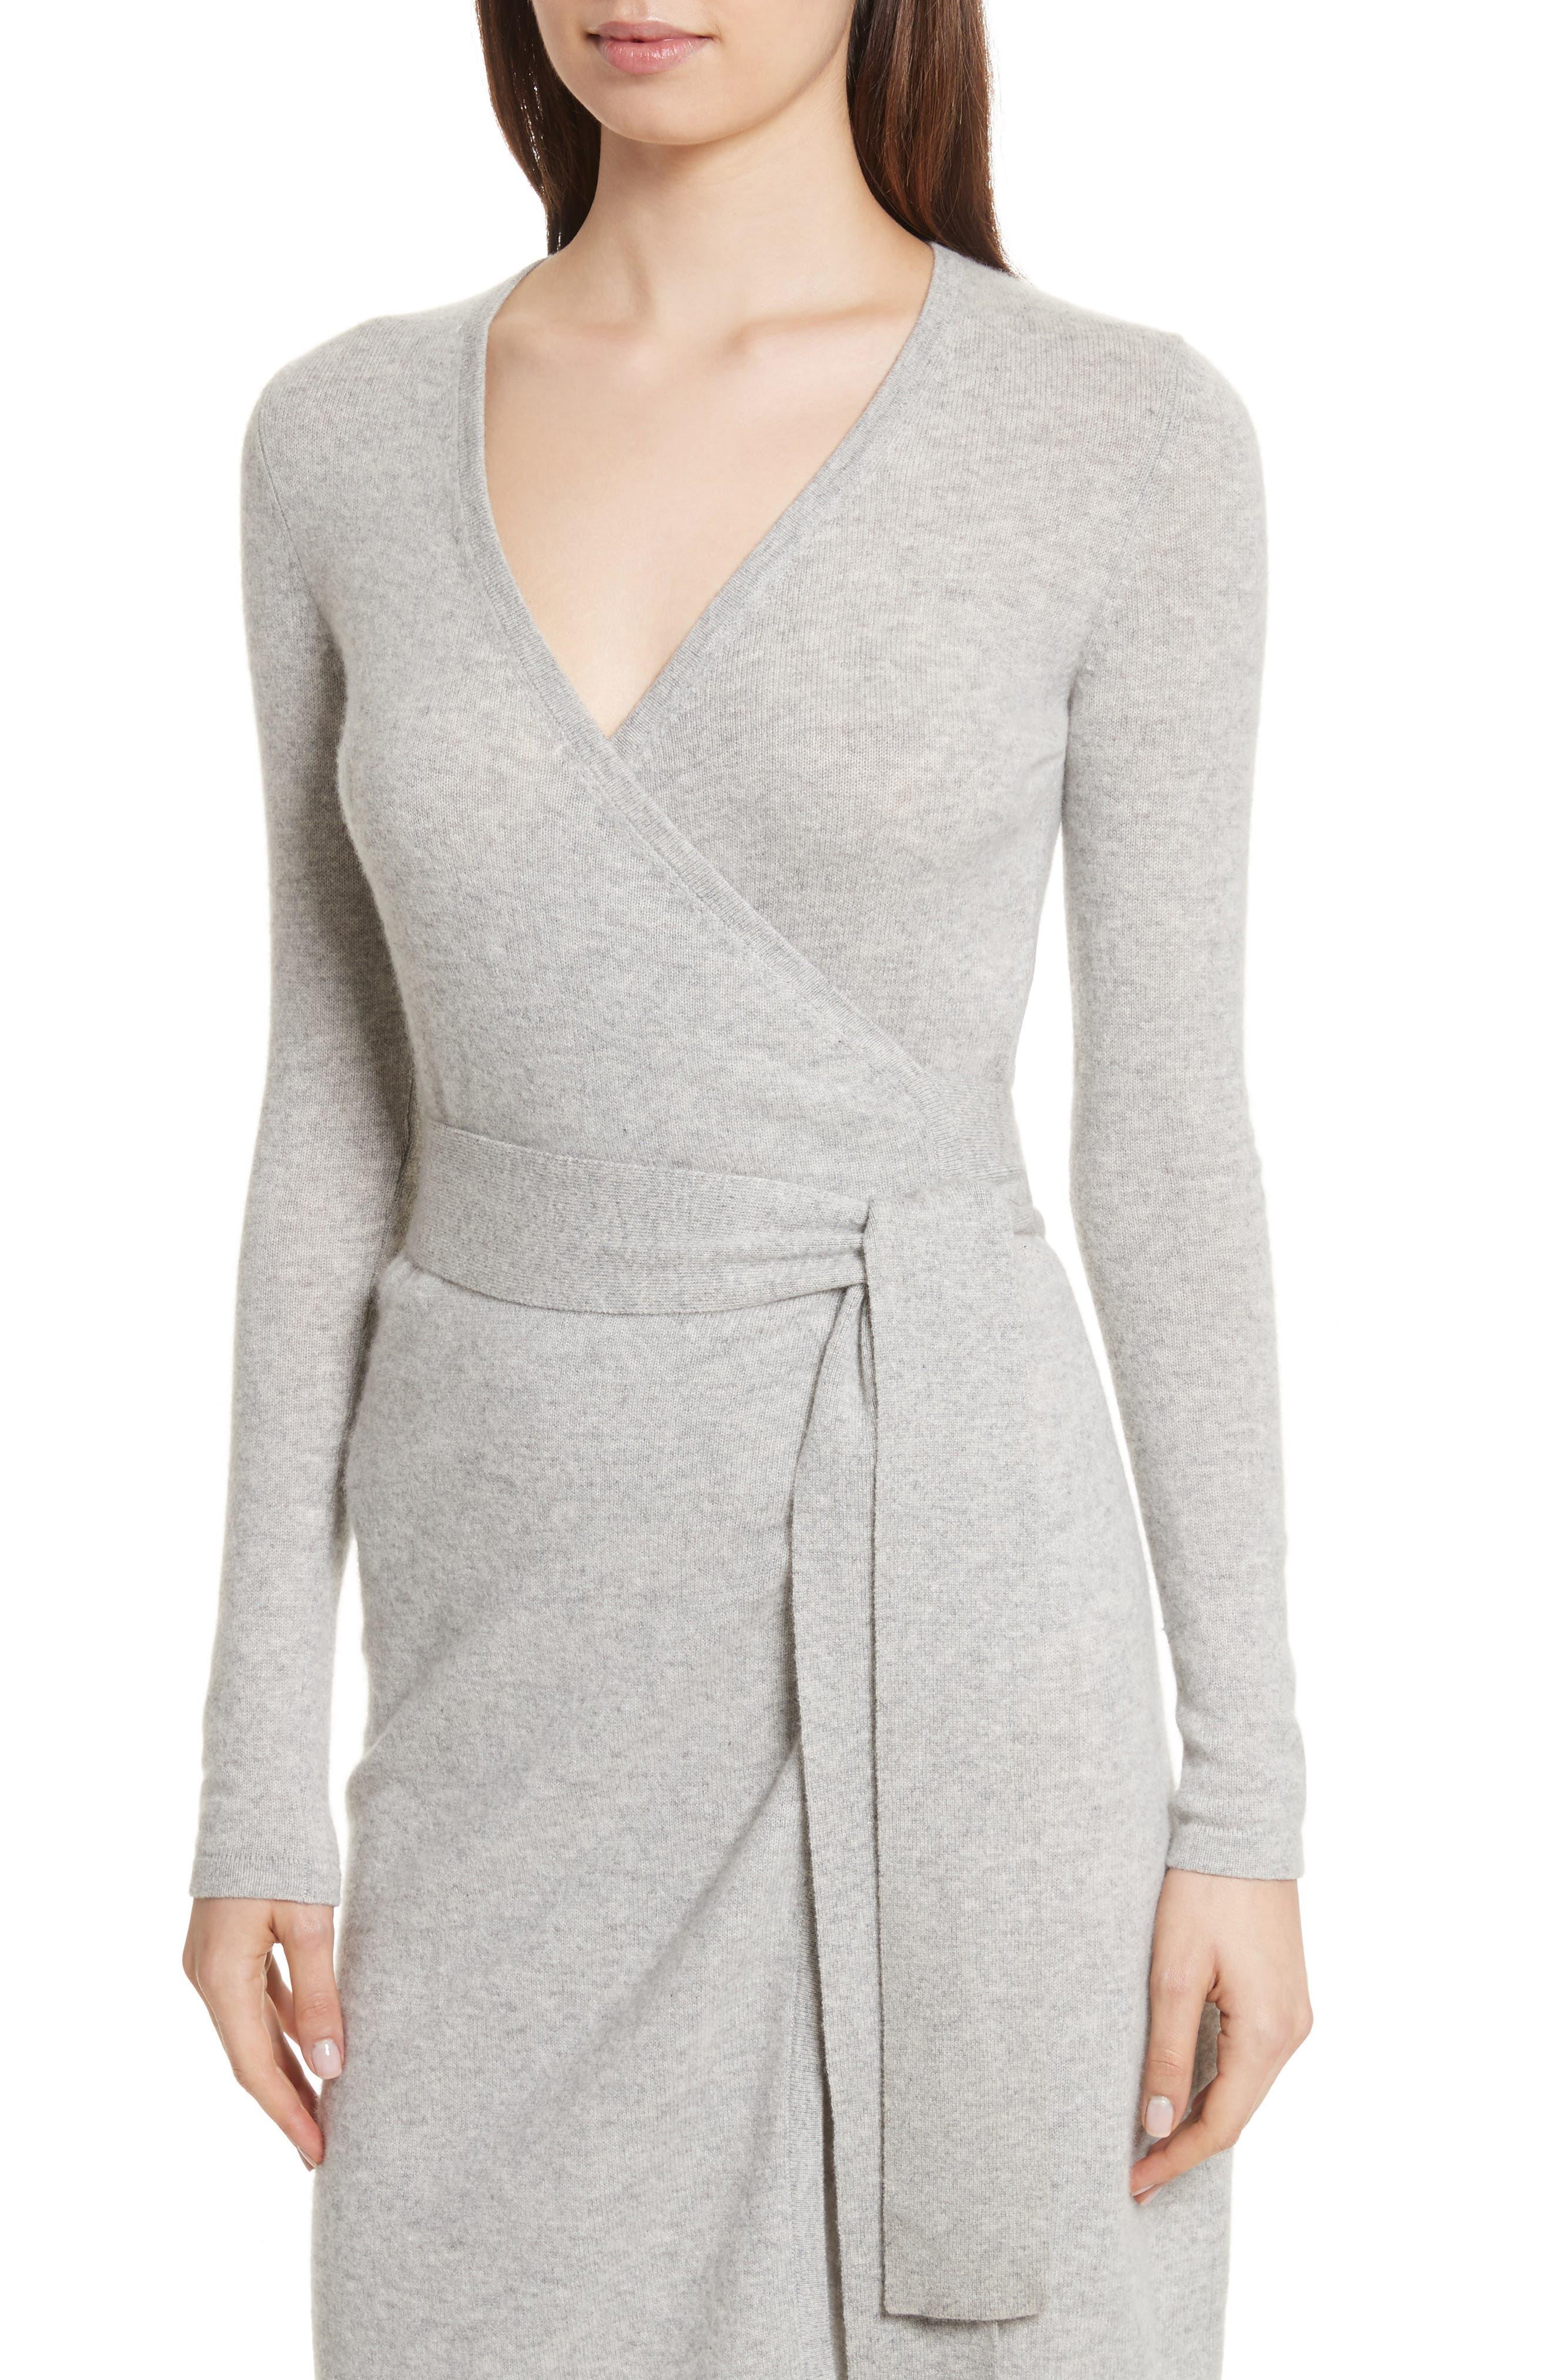 Diane Von Furstenberg Linda Cashmere Wrap Dress,                             Alternate thumbnail 8, color,